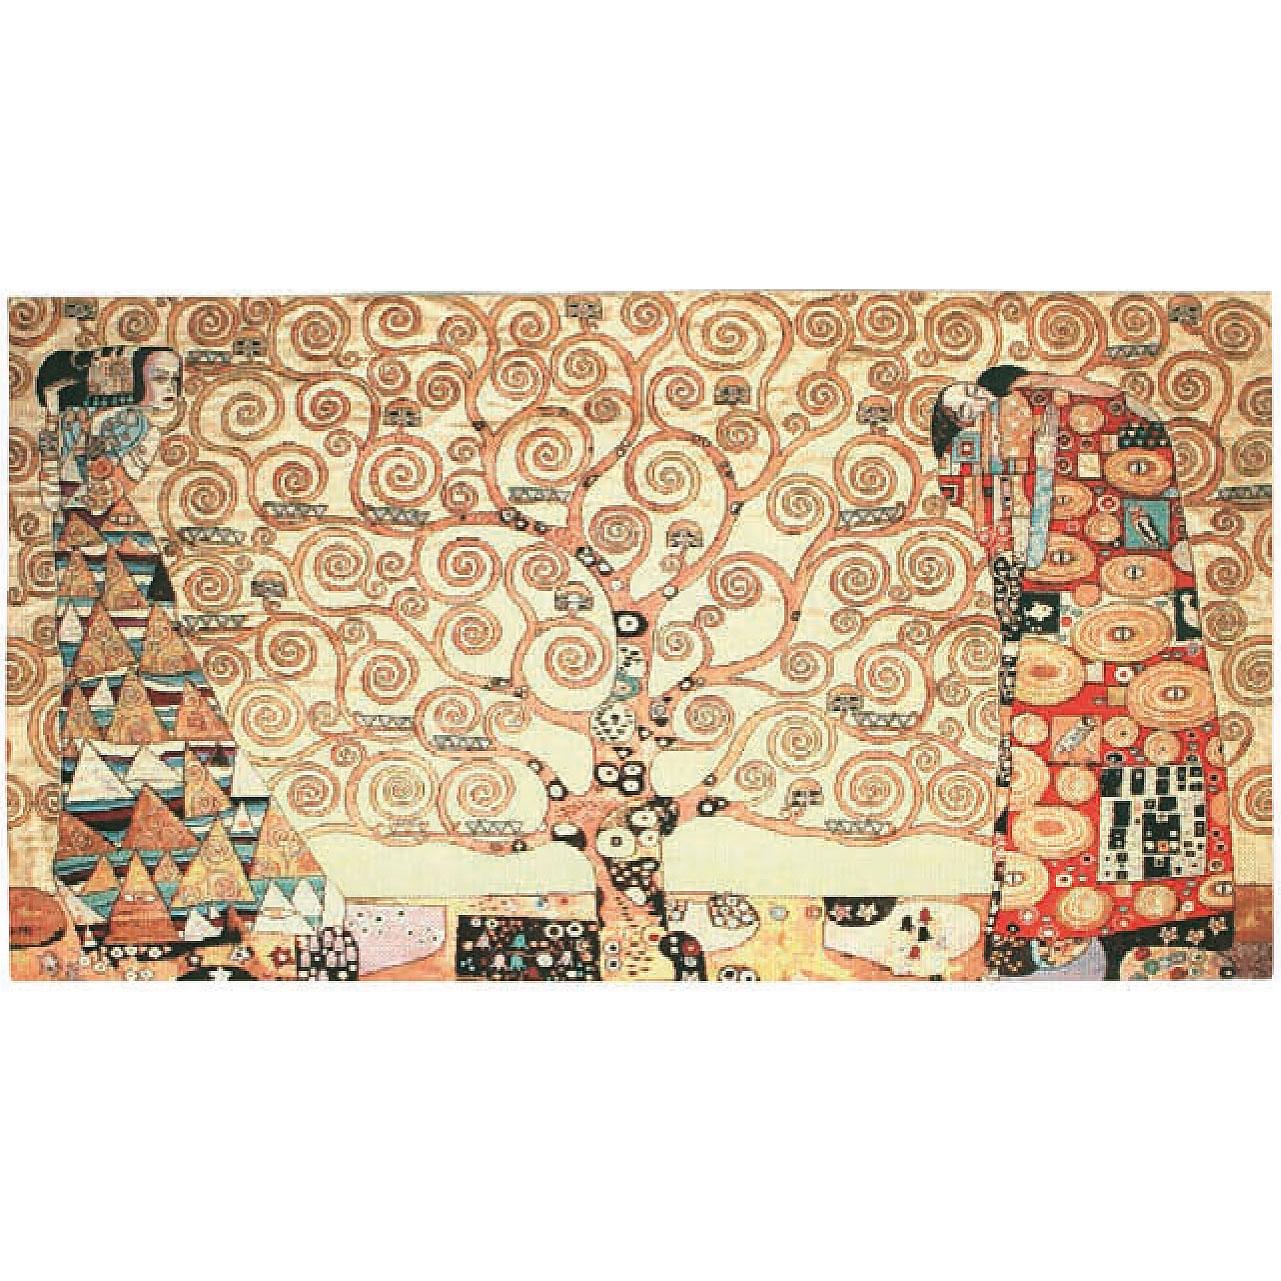 Luka, T1184 Erwartung Gustav Klimt  <br> Гобелен Дерево жизни Густав Климт <br>размер 110х065